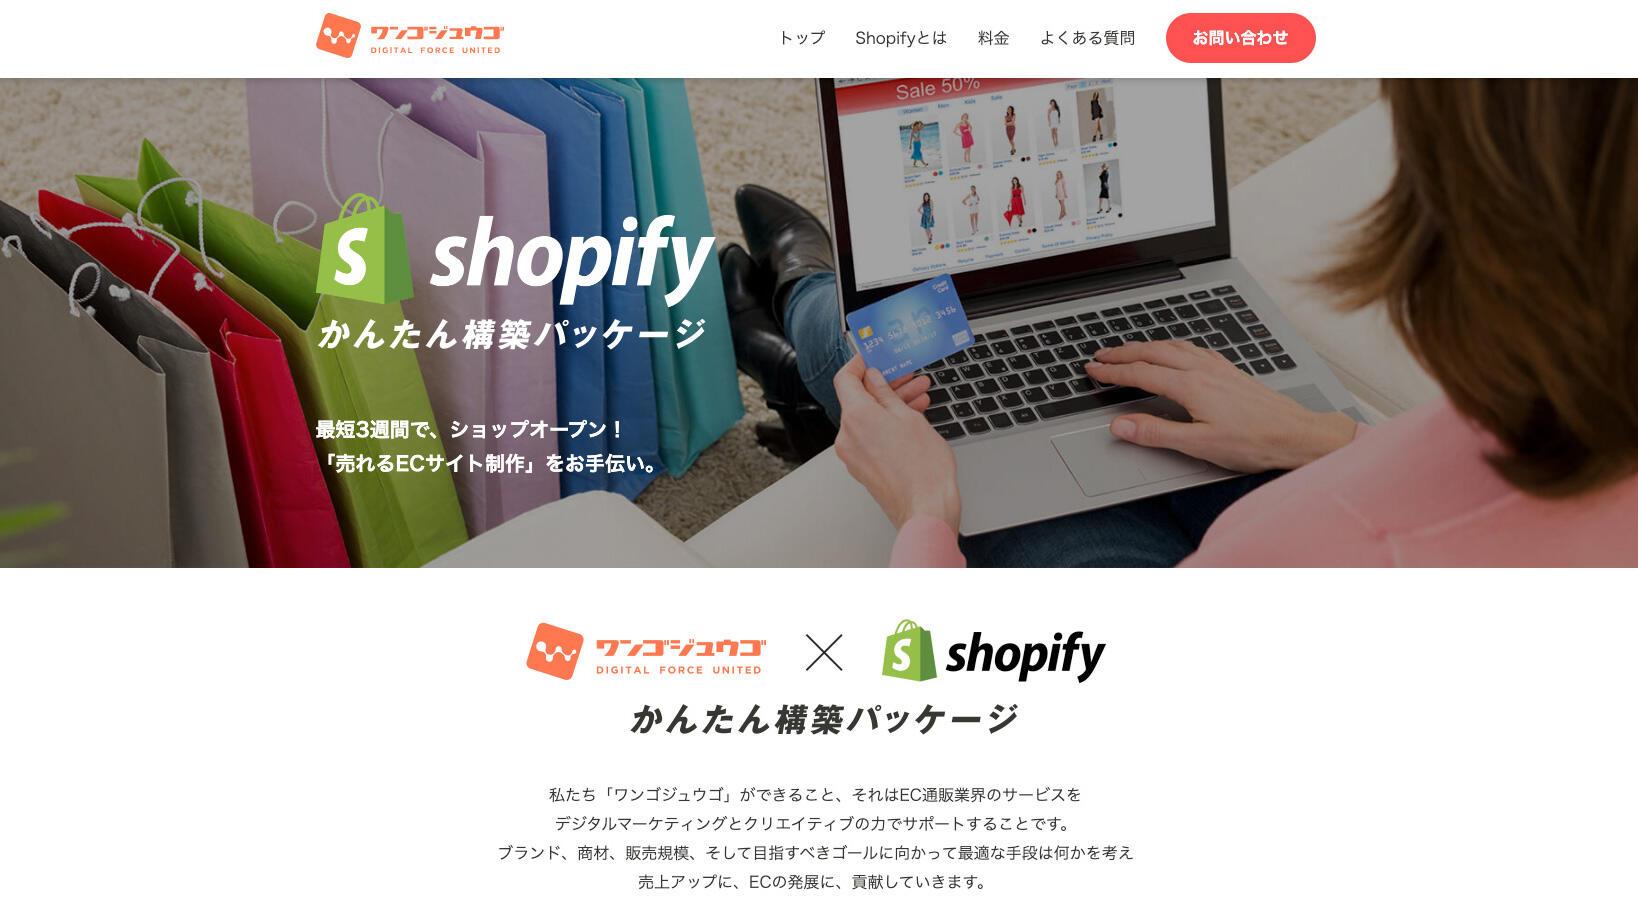 wan55_shopify.jpg